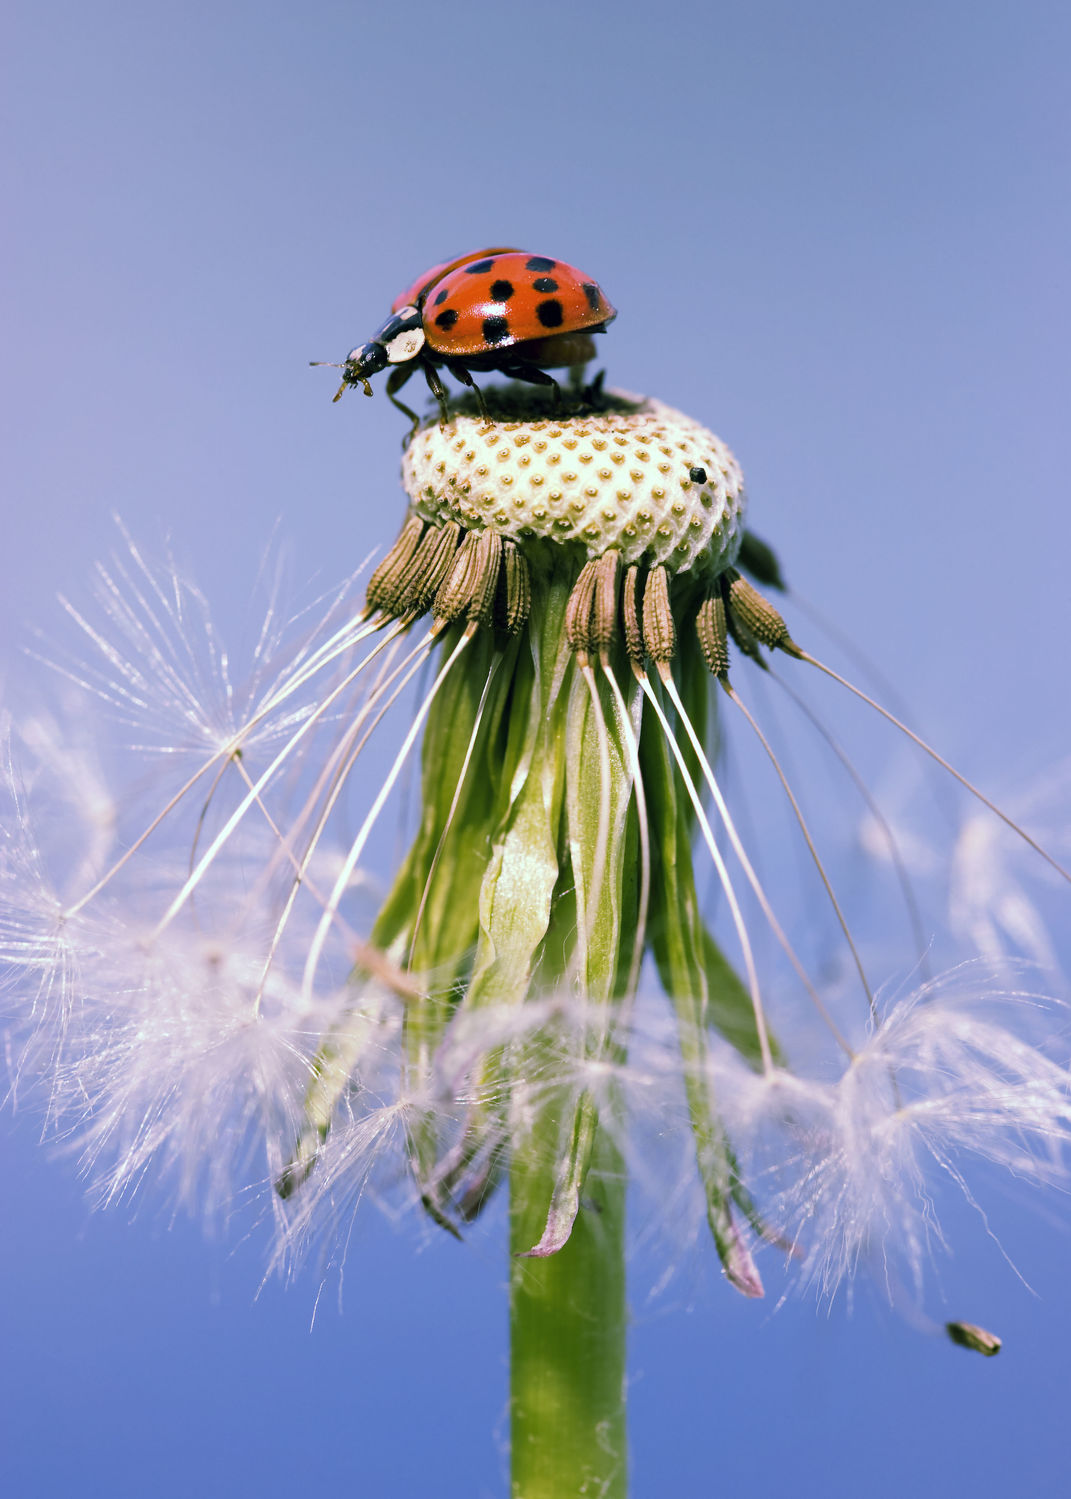 Bild mit Blumen, Frühling, Insekten, Blume, blue, Löwenzahn, Pusteblume, Marienkäfer, Blüten, Pusteblumen, frühjahr, Insekt, Käfer